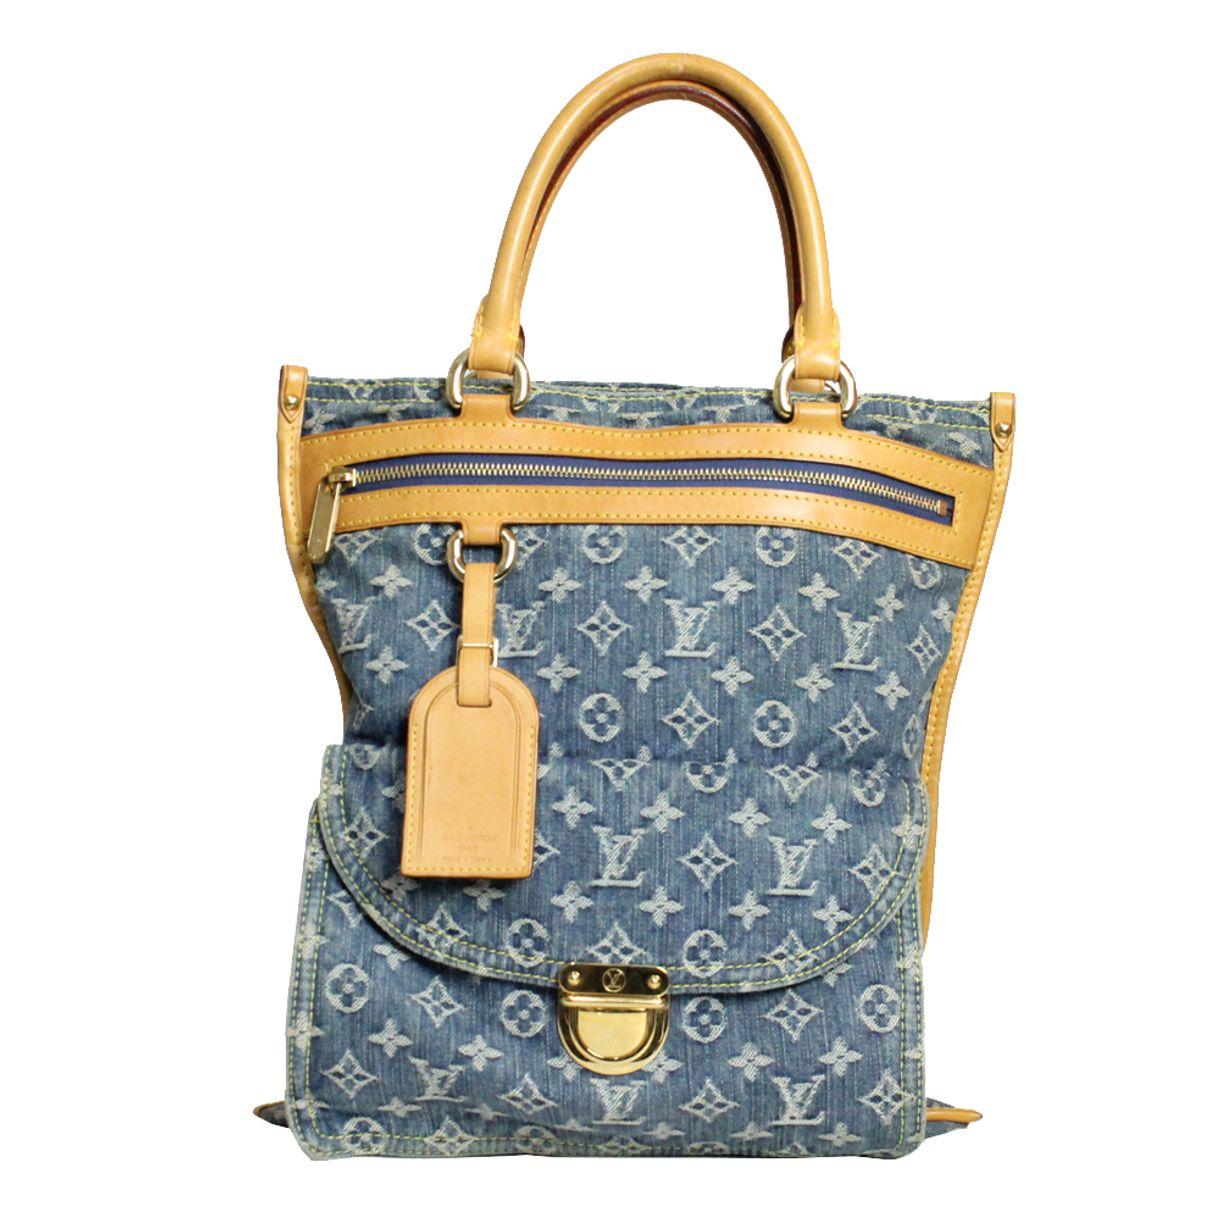 Bolsa-Louis-Vuitton-Denim-Sac-Plat